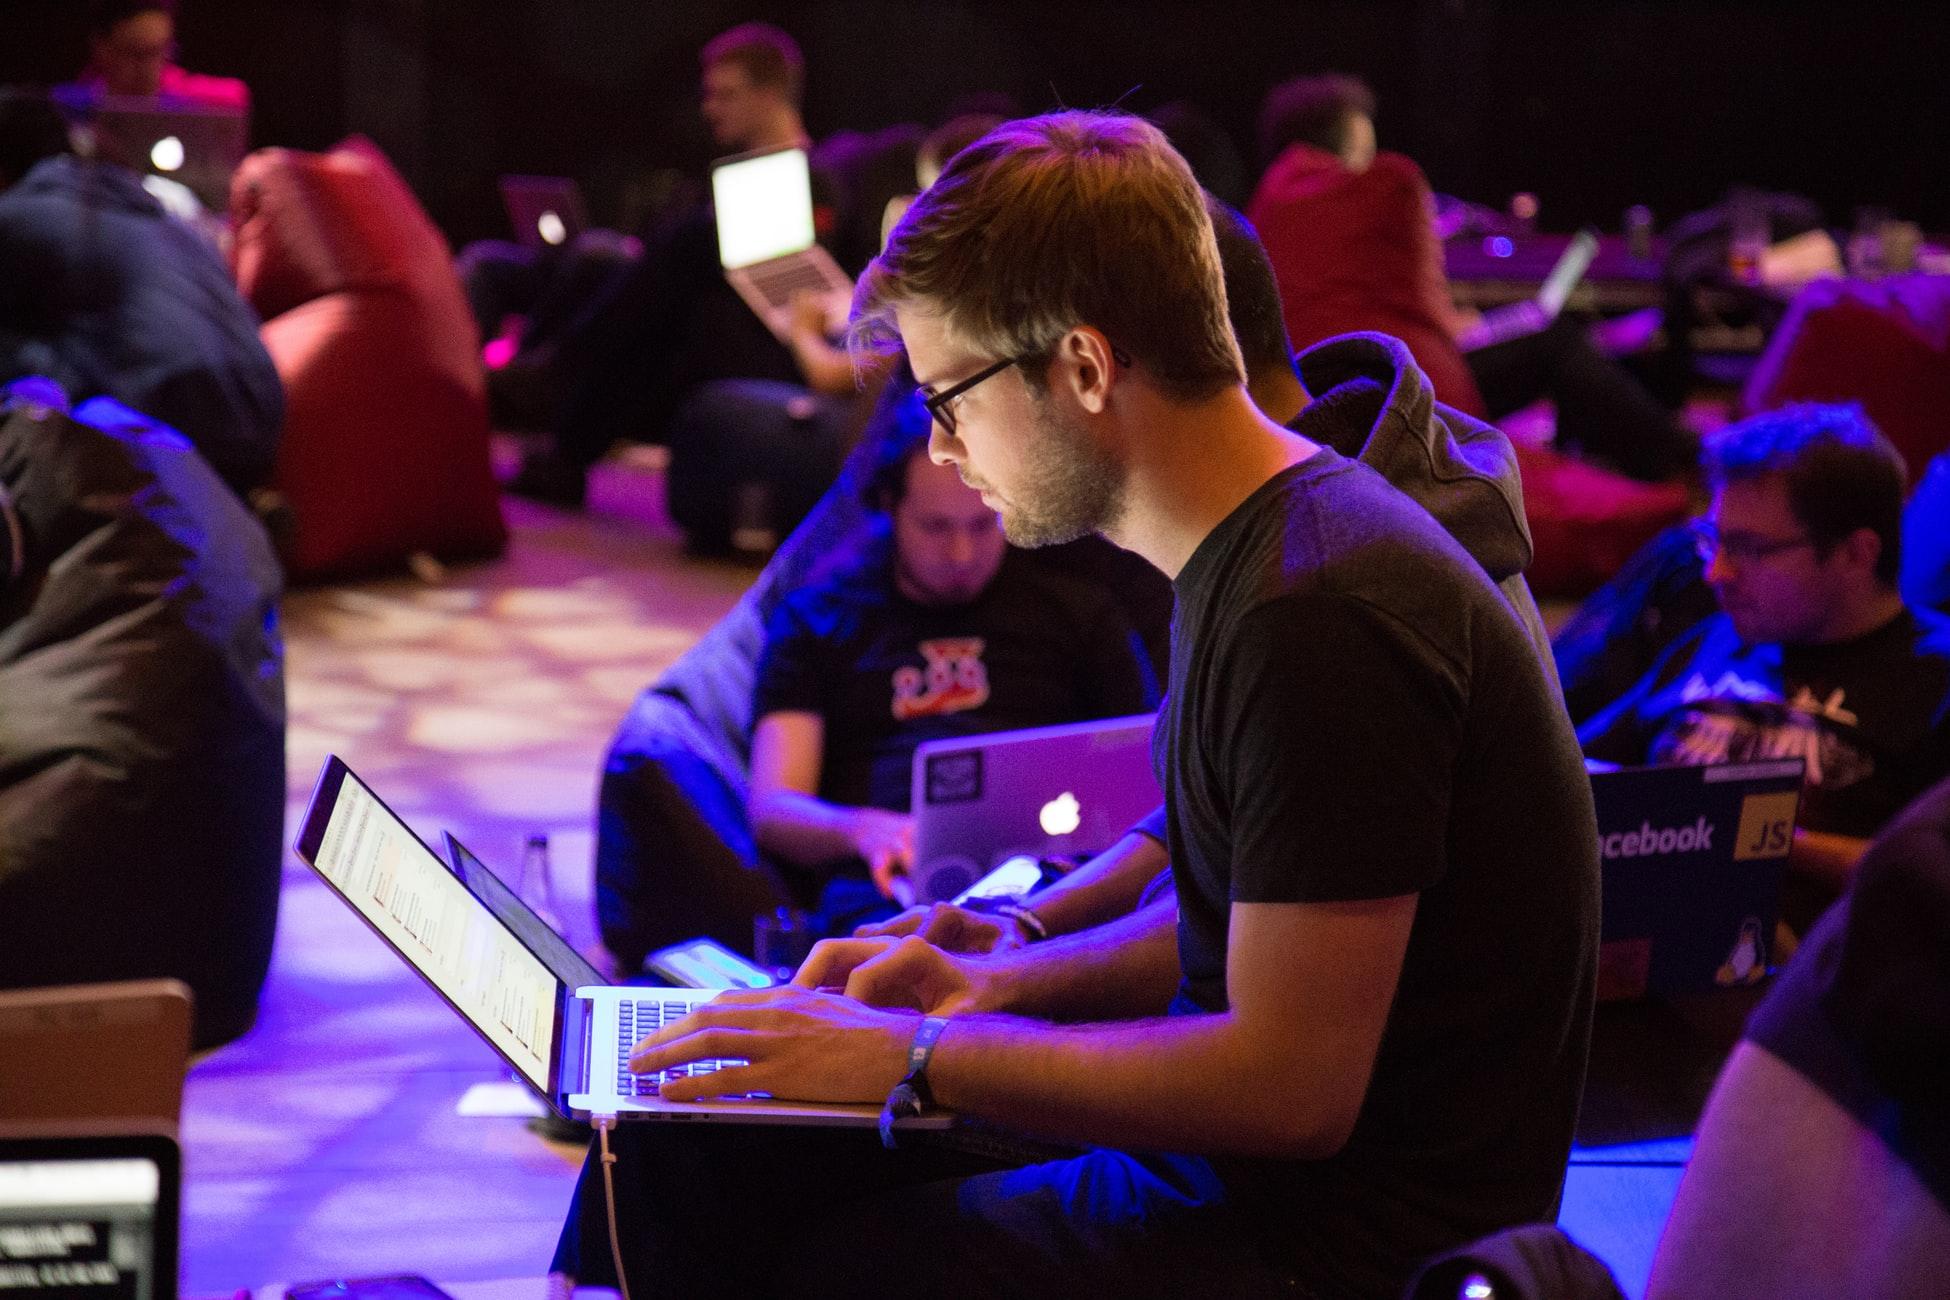 Hackathon TU Wien